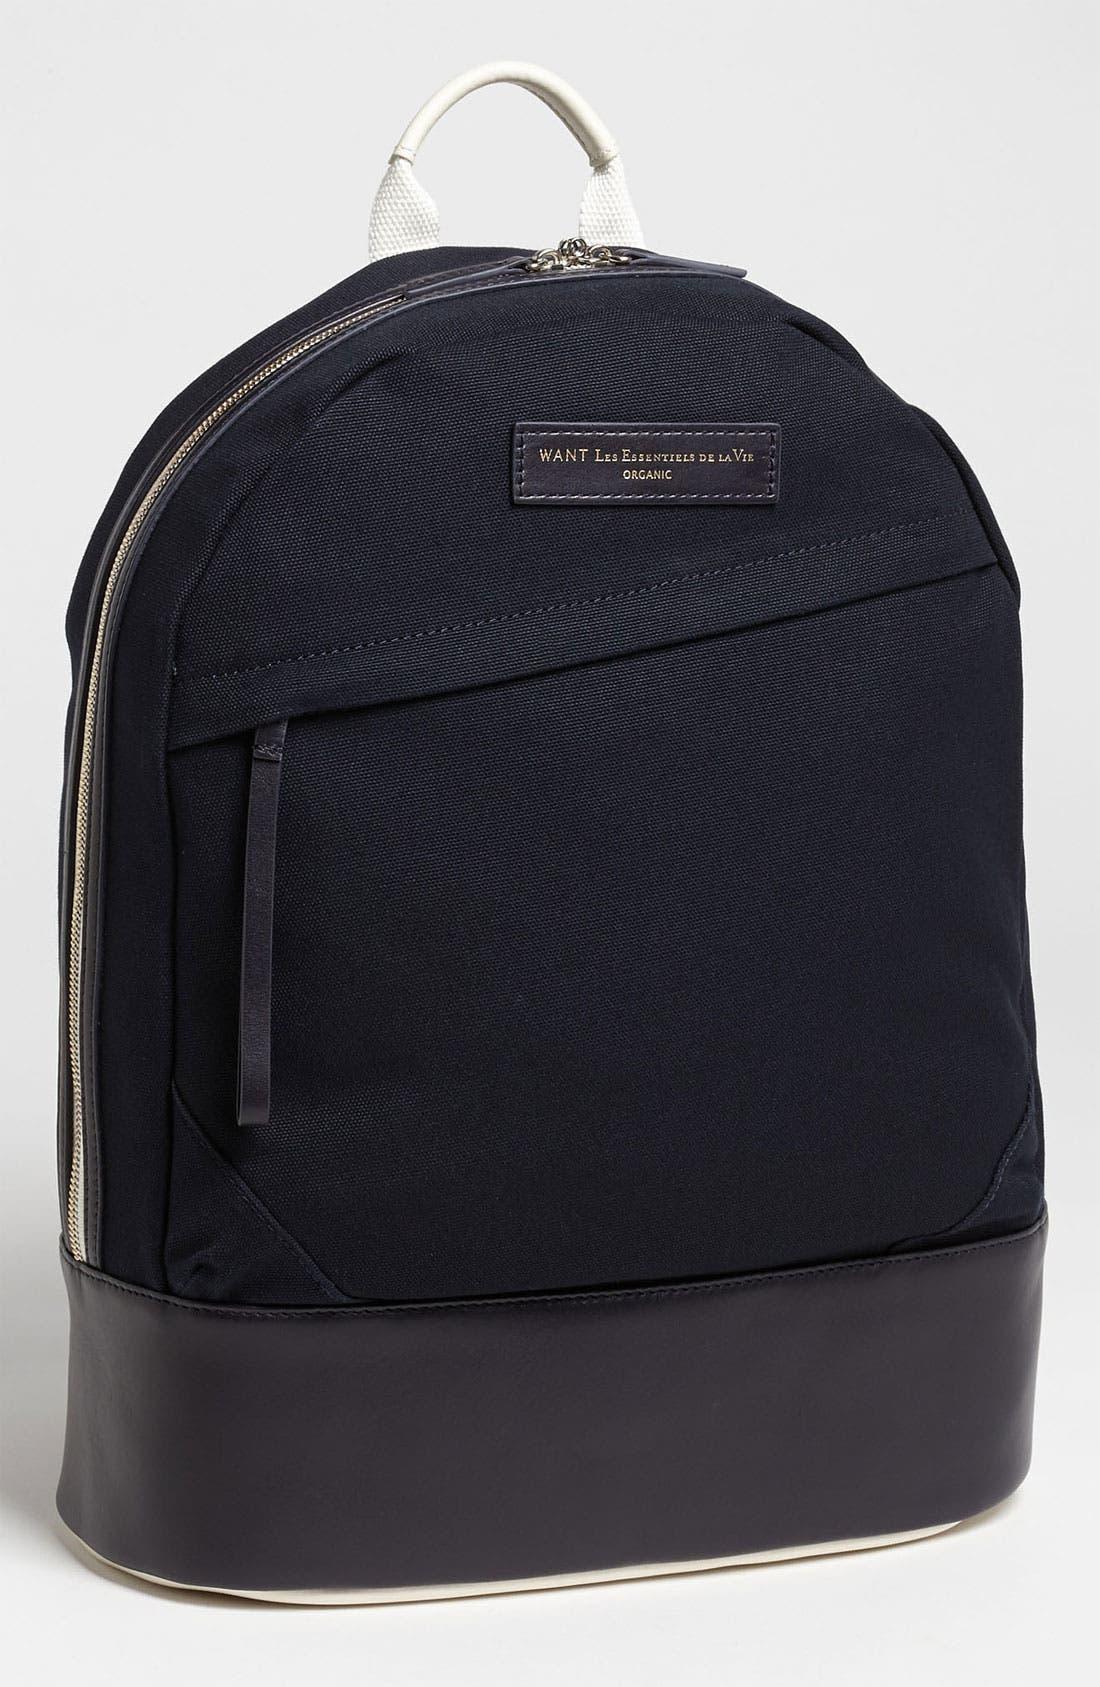 Alternate Image 1 Selected - WANT Les Essentiels de la Vie 'Kastrup' Backpack